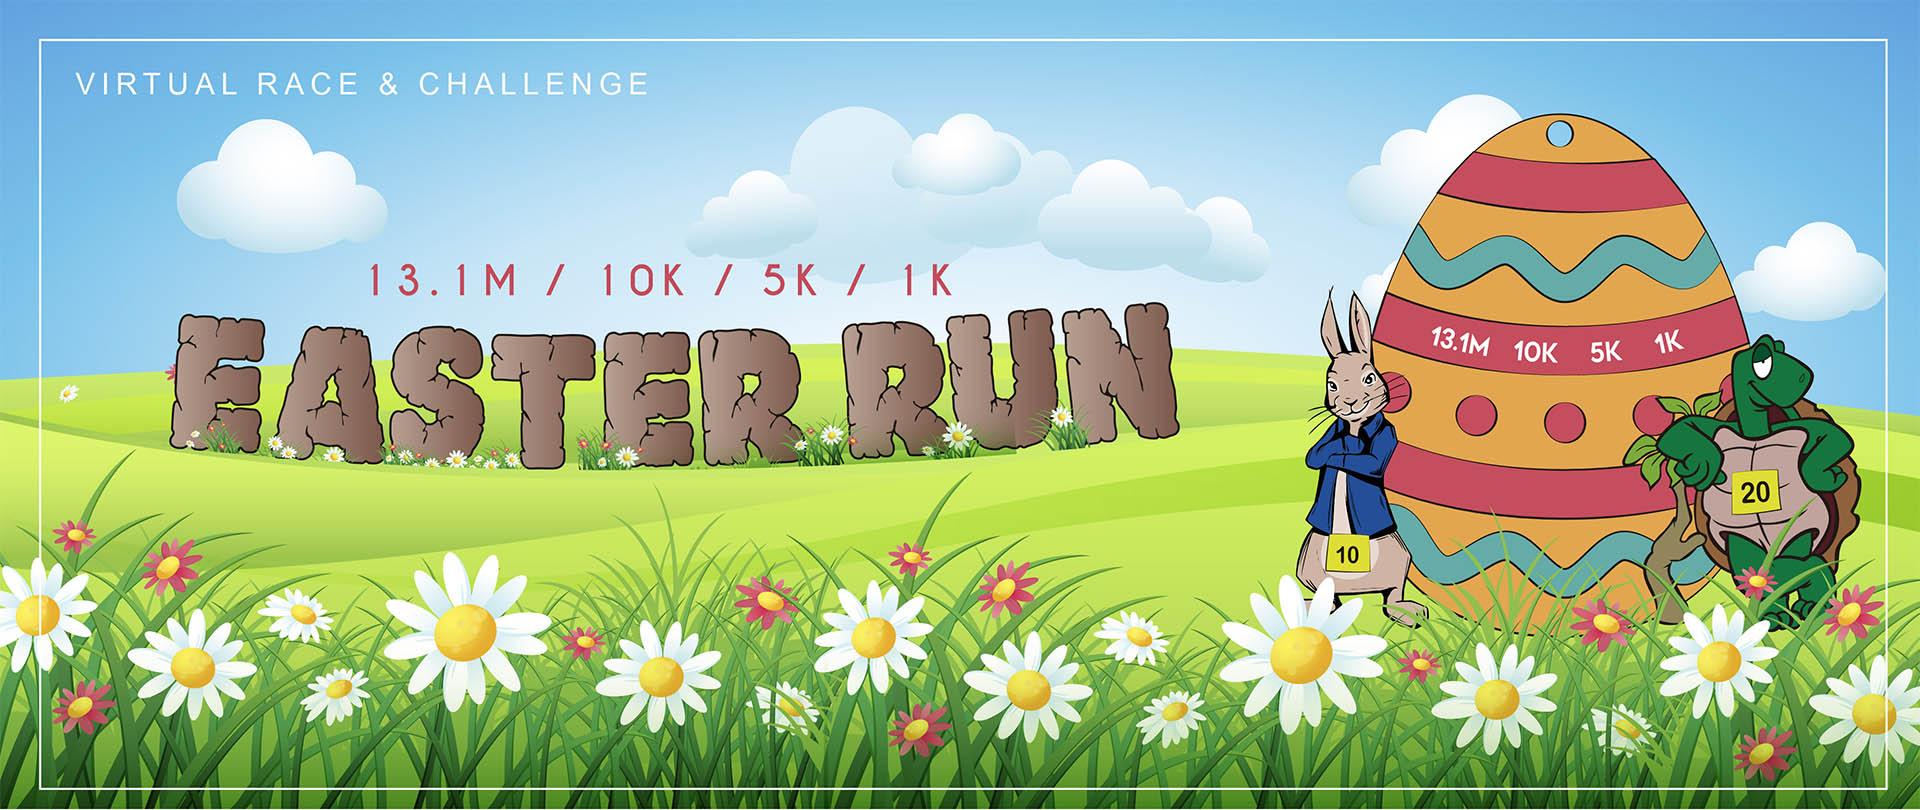 Easter Run 2